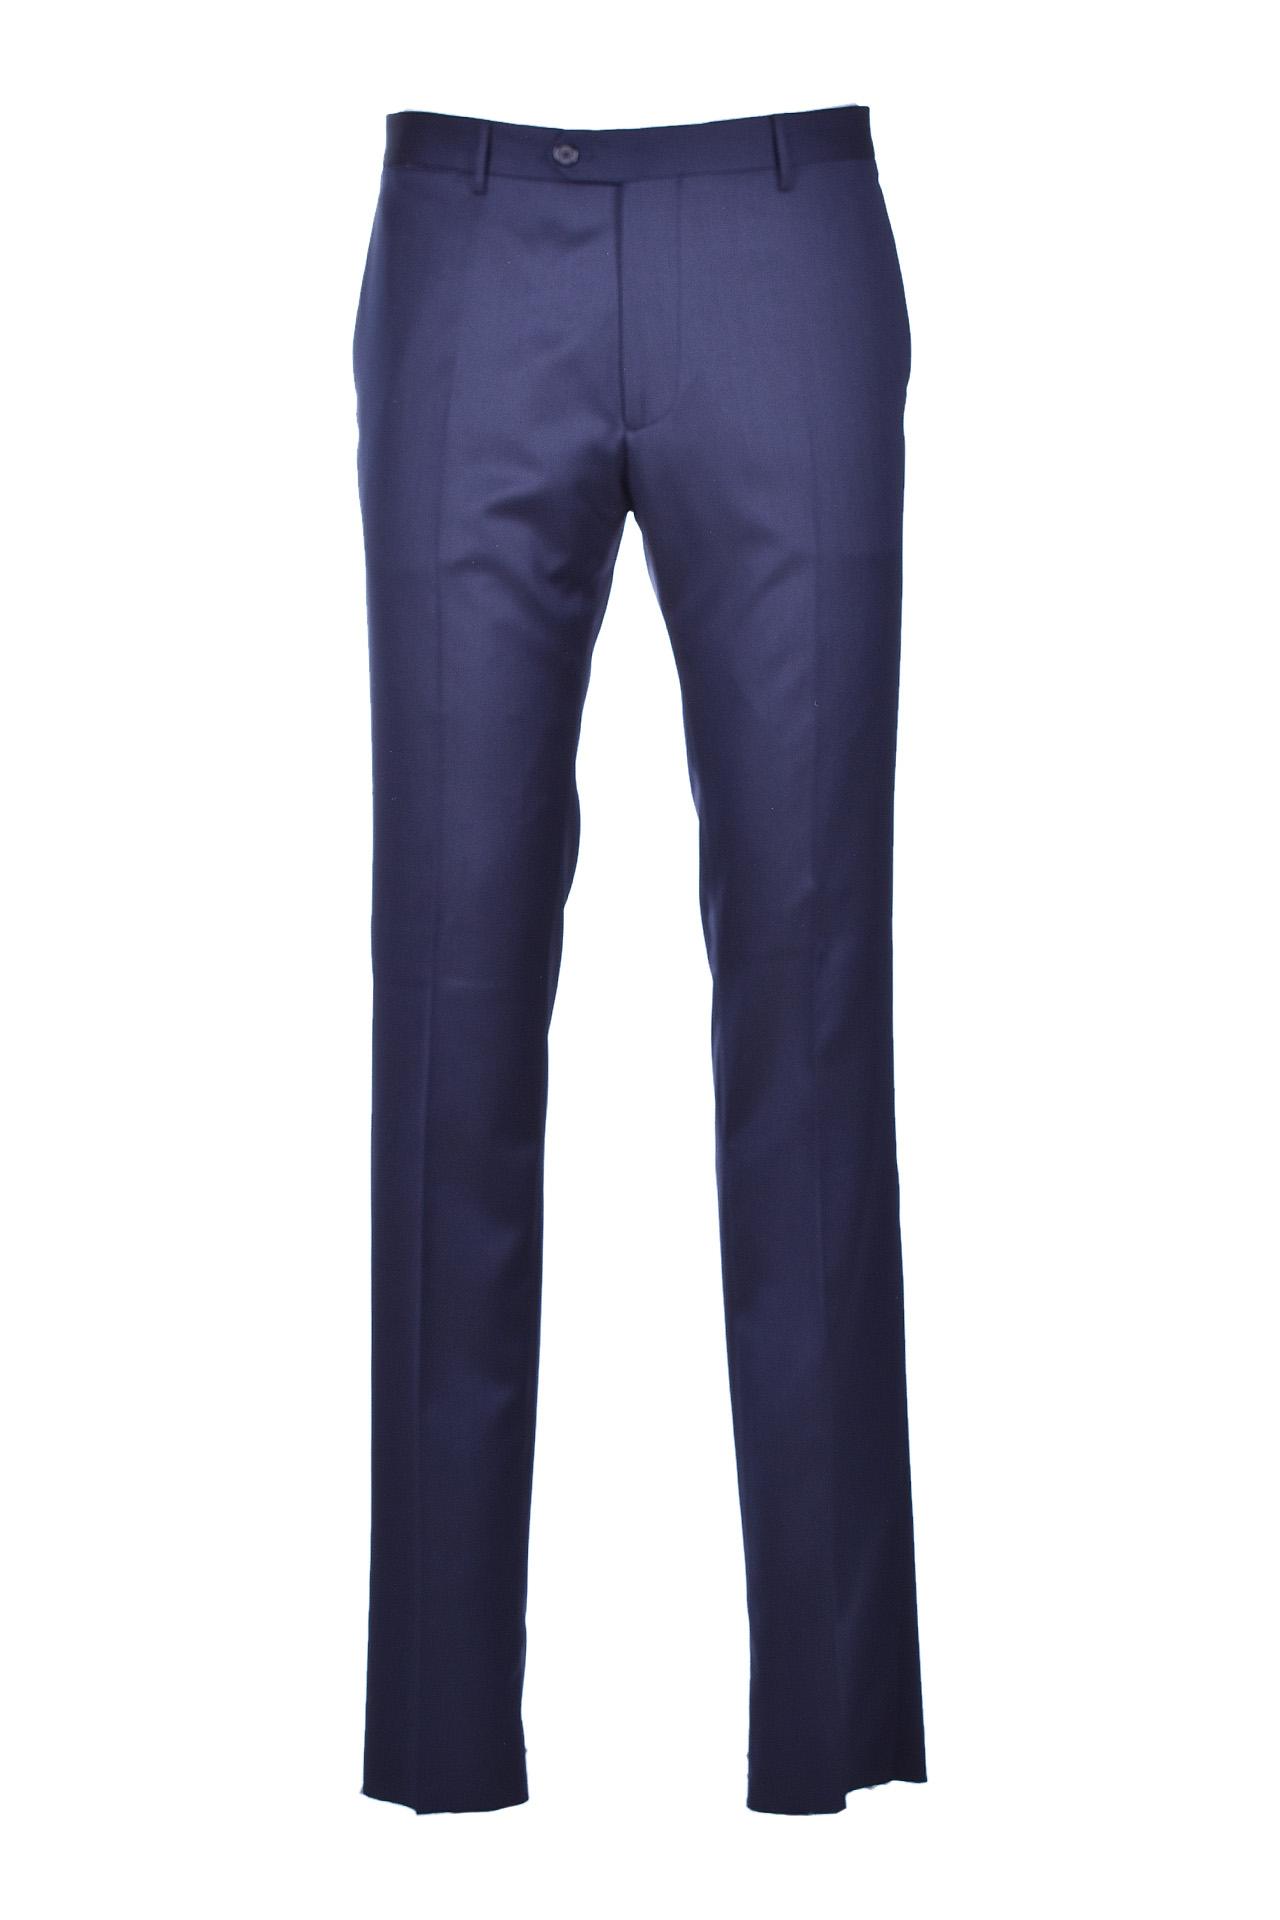 abito da uomo in fresco lana slim fit - blu TAGLIATORE | Abiti | 2SMC22B01 06UPZ245I3146